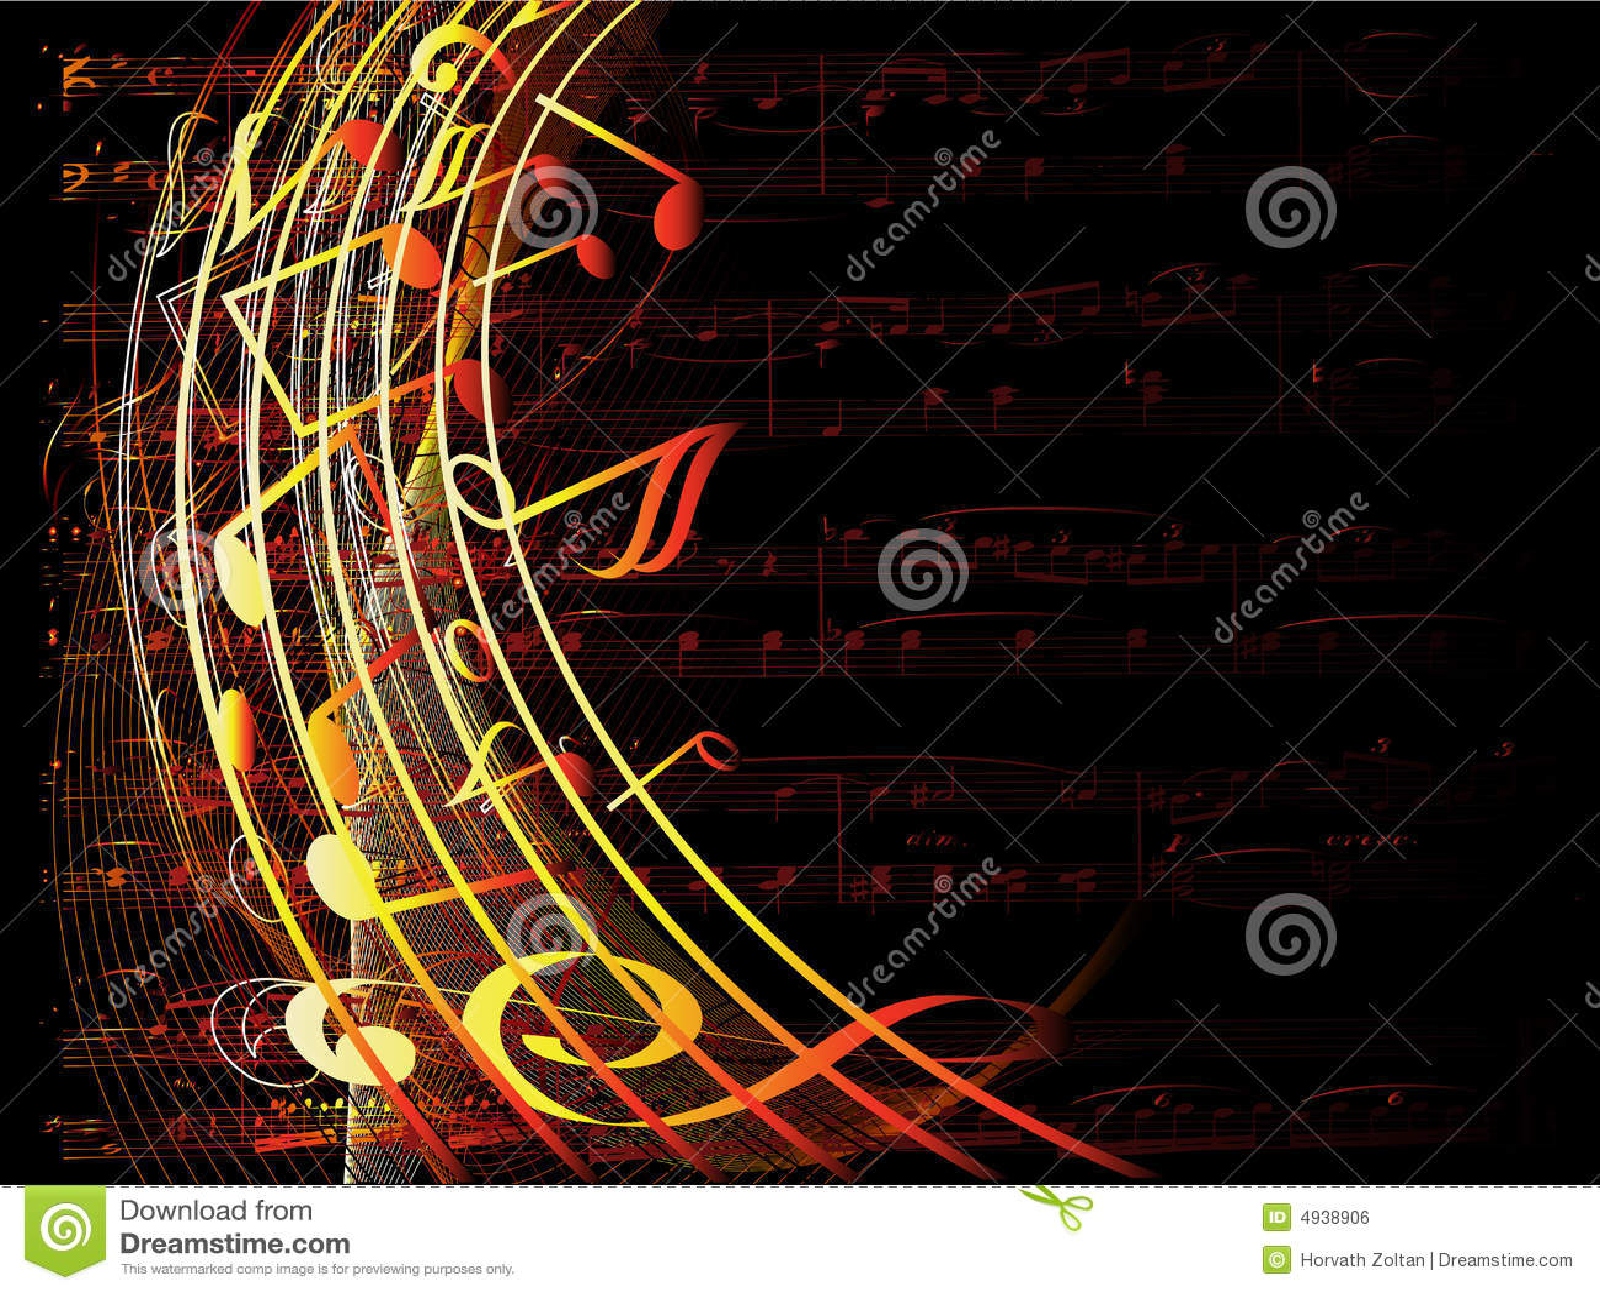 3d Dj Wallpaper Free Download Fundo Musical Ilustra 231 227 O Do Vetor Ilustra 231 227 O De Quente